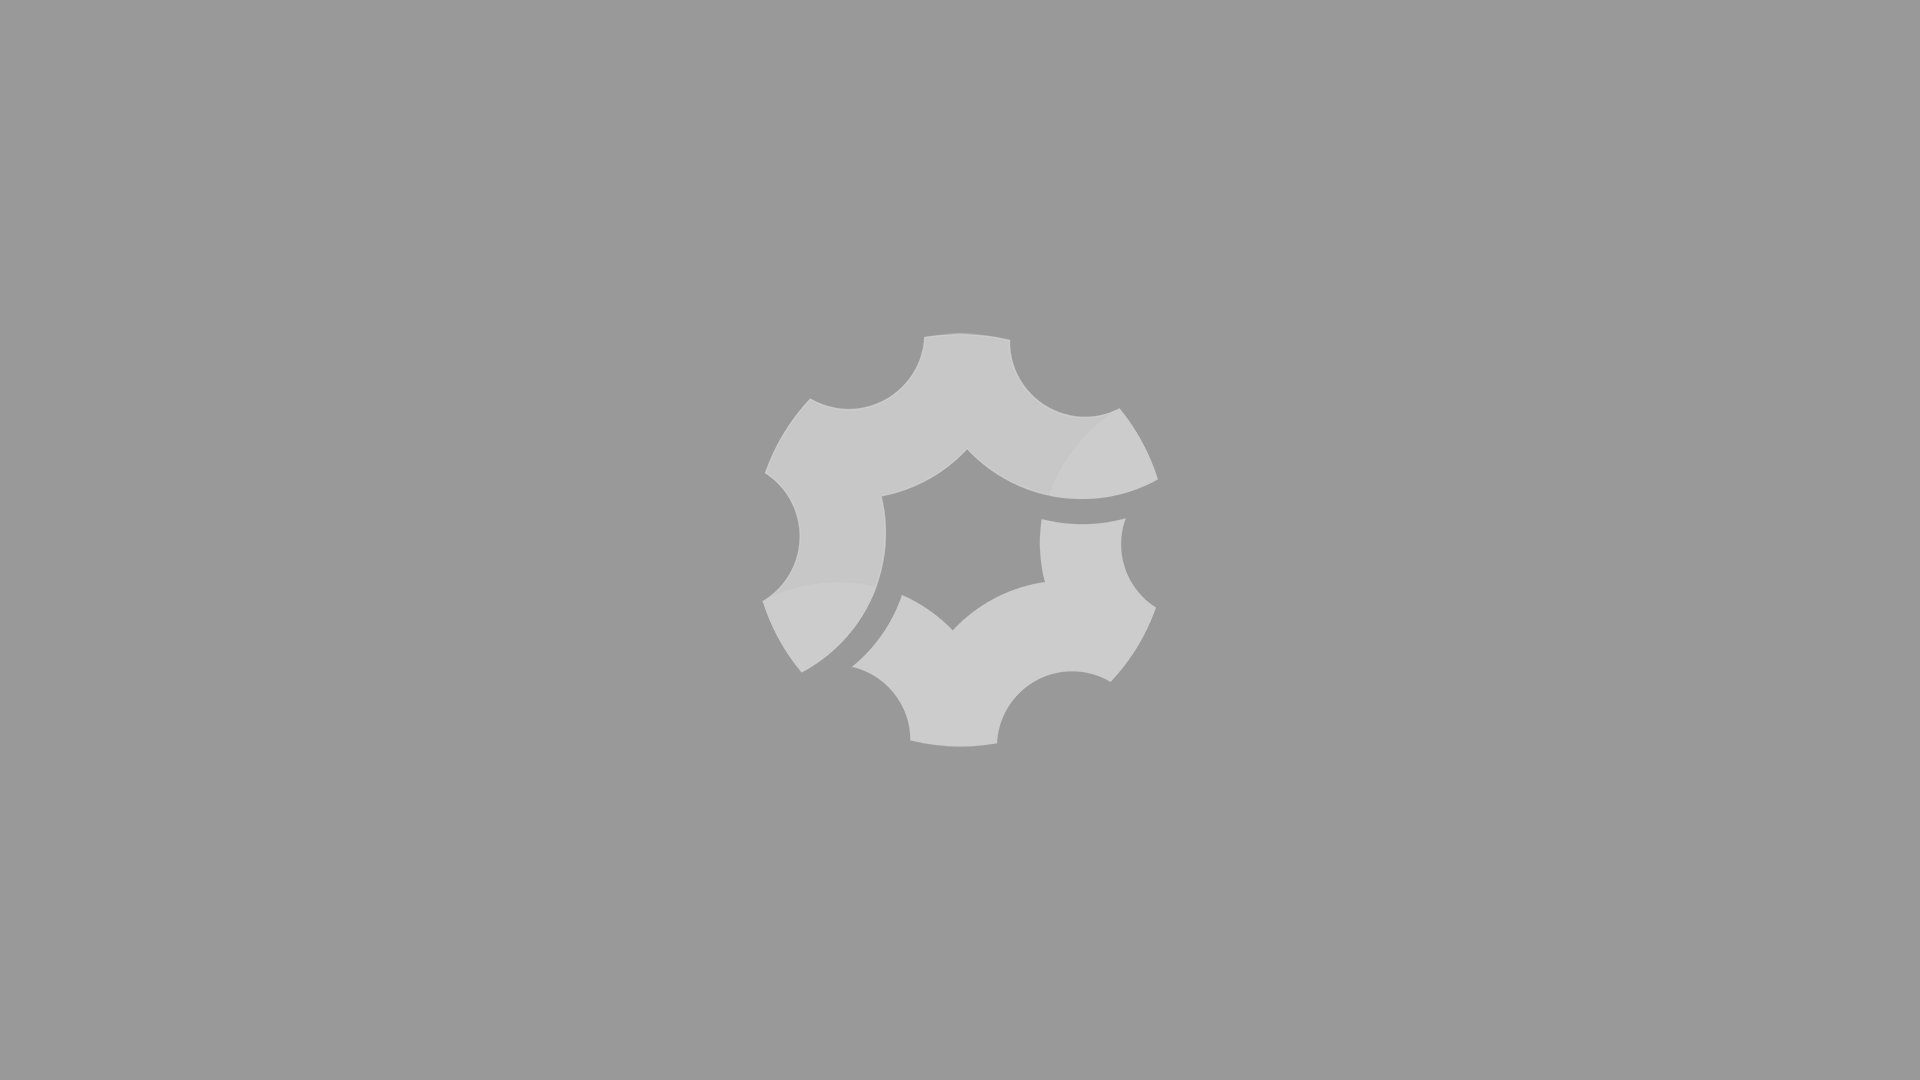 insurgency_sandstorm_screenshot_2020.05.01_-_00.06.25.93.png